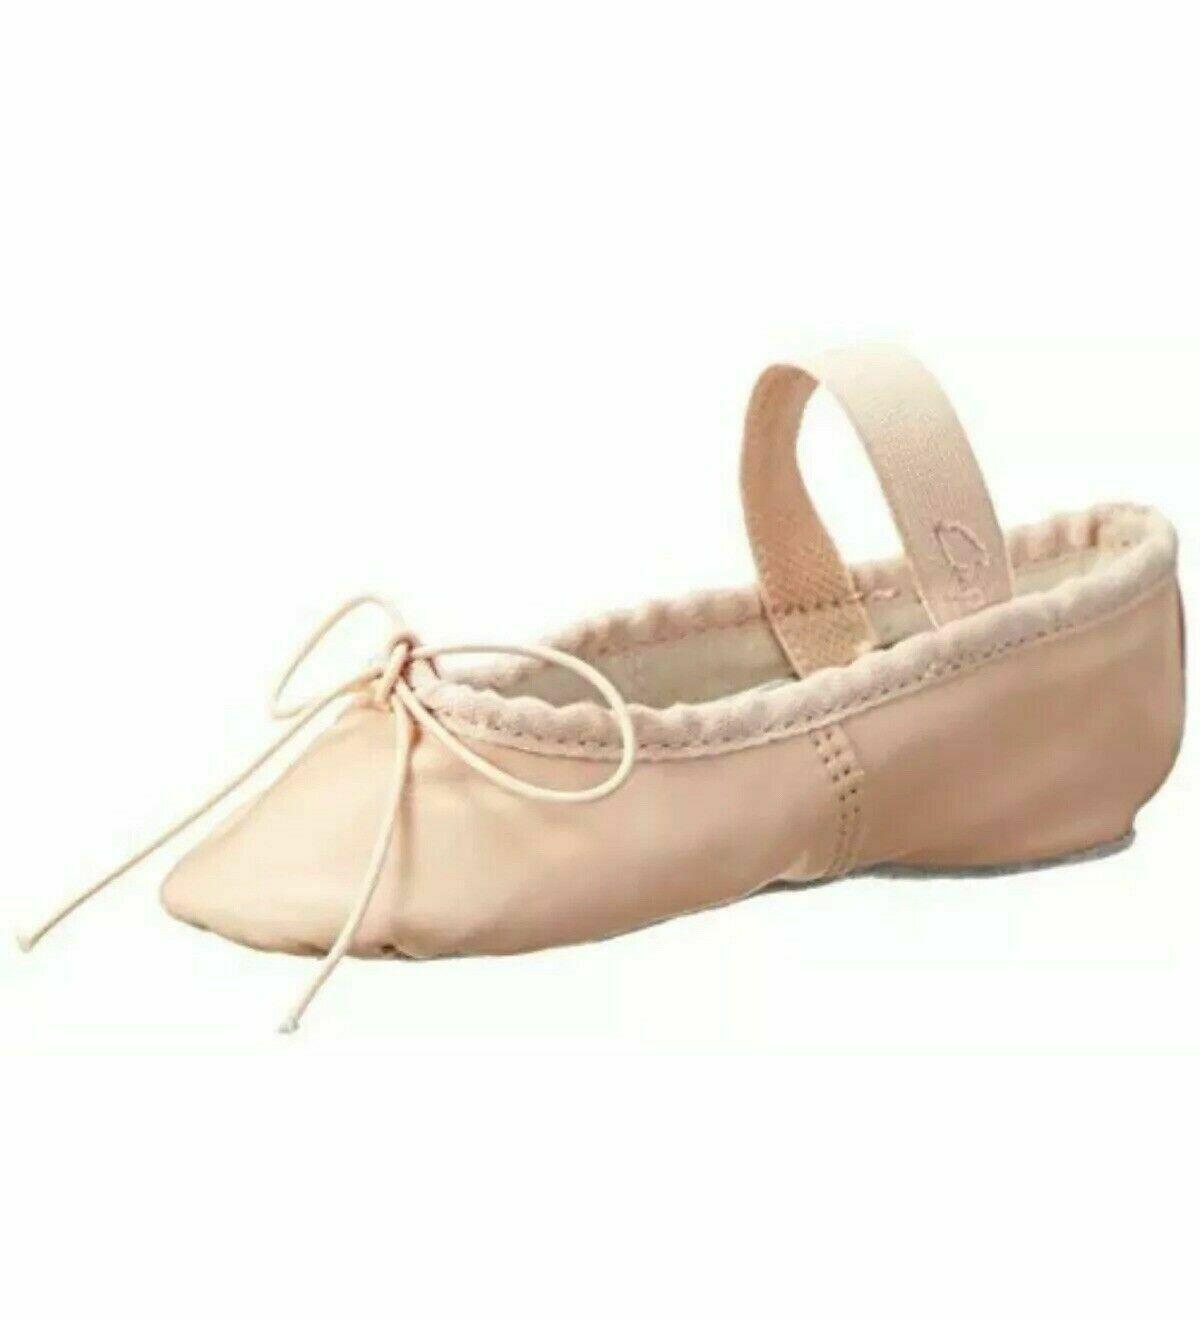 Capezio Adult Teknik 200 NPK Pink Full Sole Ballet Shoe Size 5B 5 B